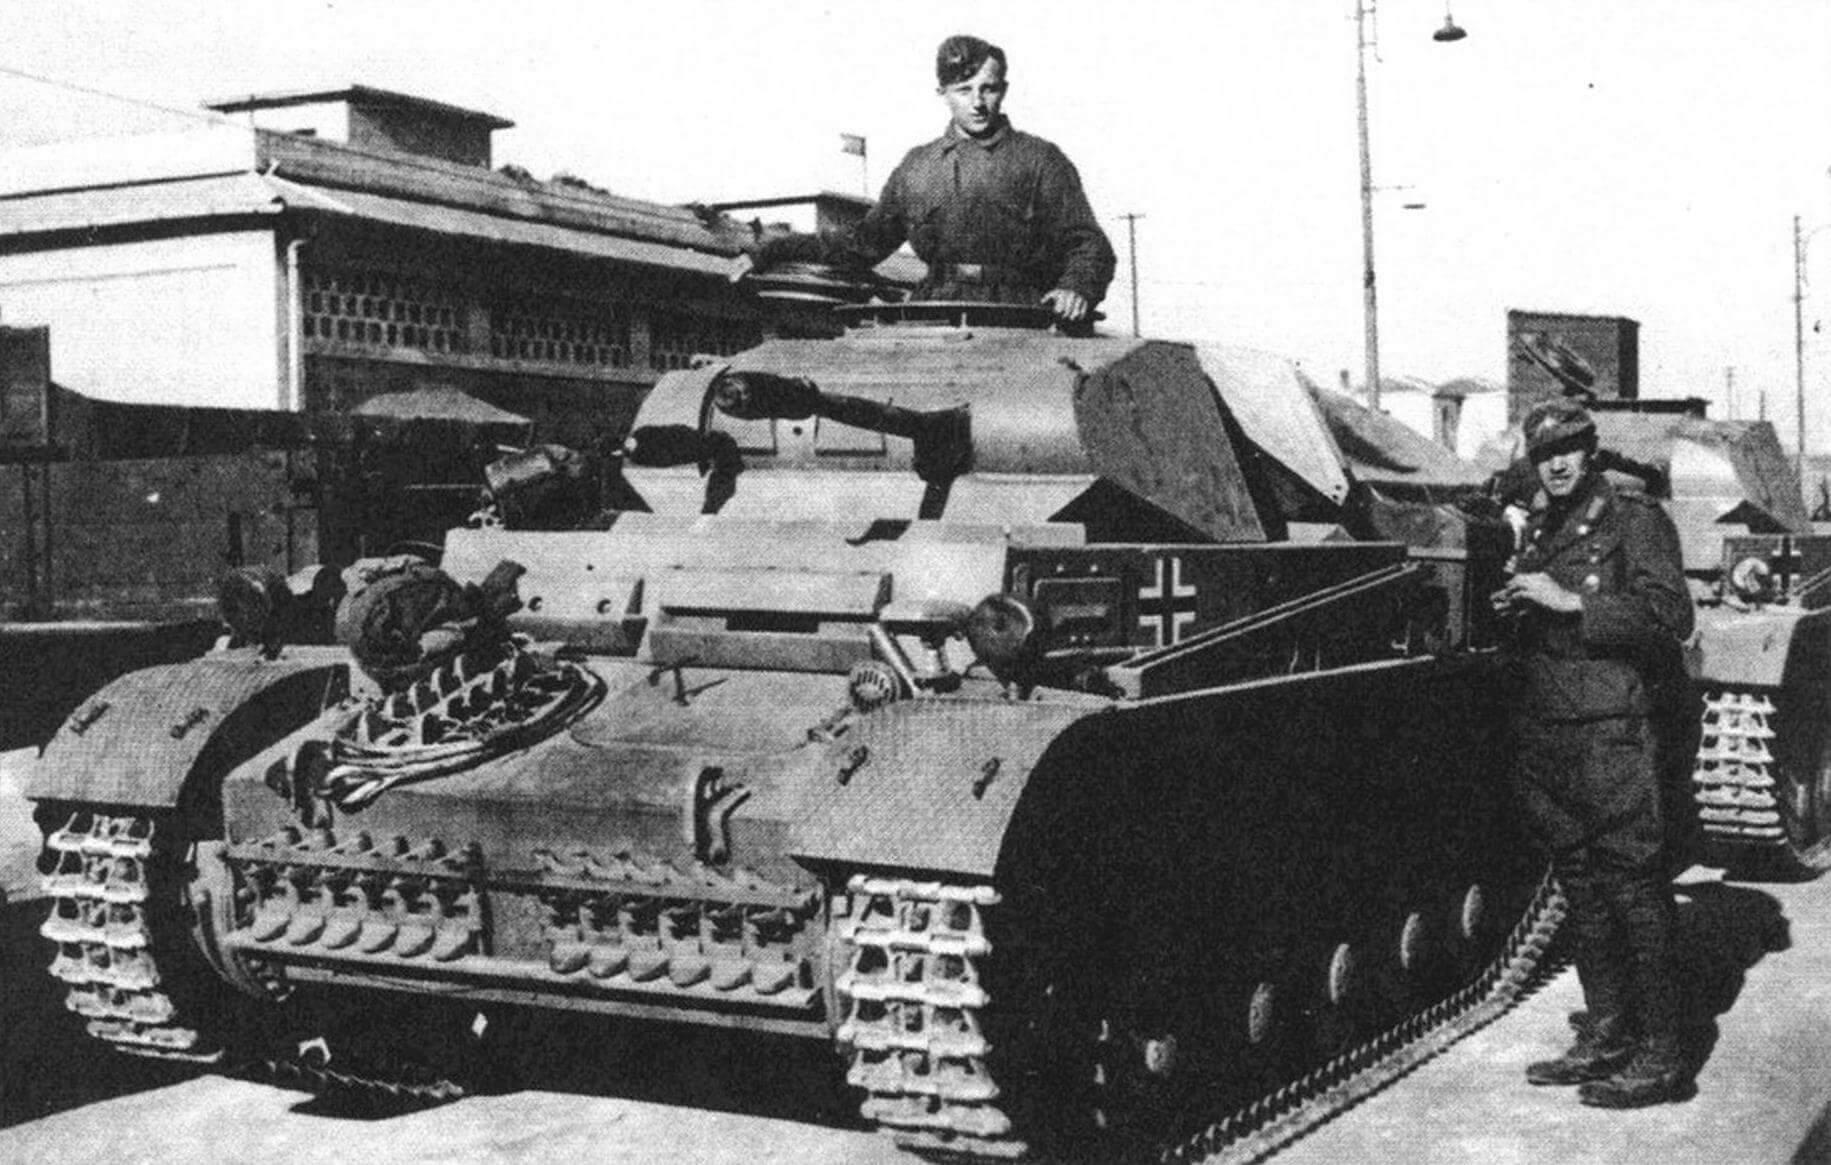 Танки Pz.II Ausf.F 15-й танковой дивизии в Бенгази. Ливия, 19 декабря 1941 года